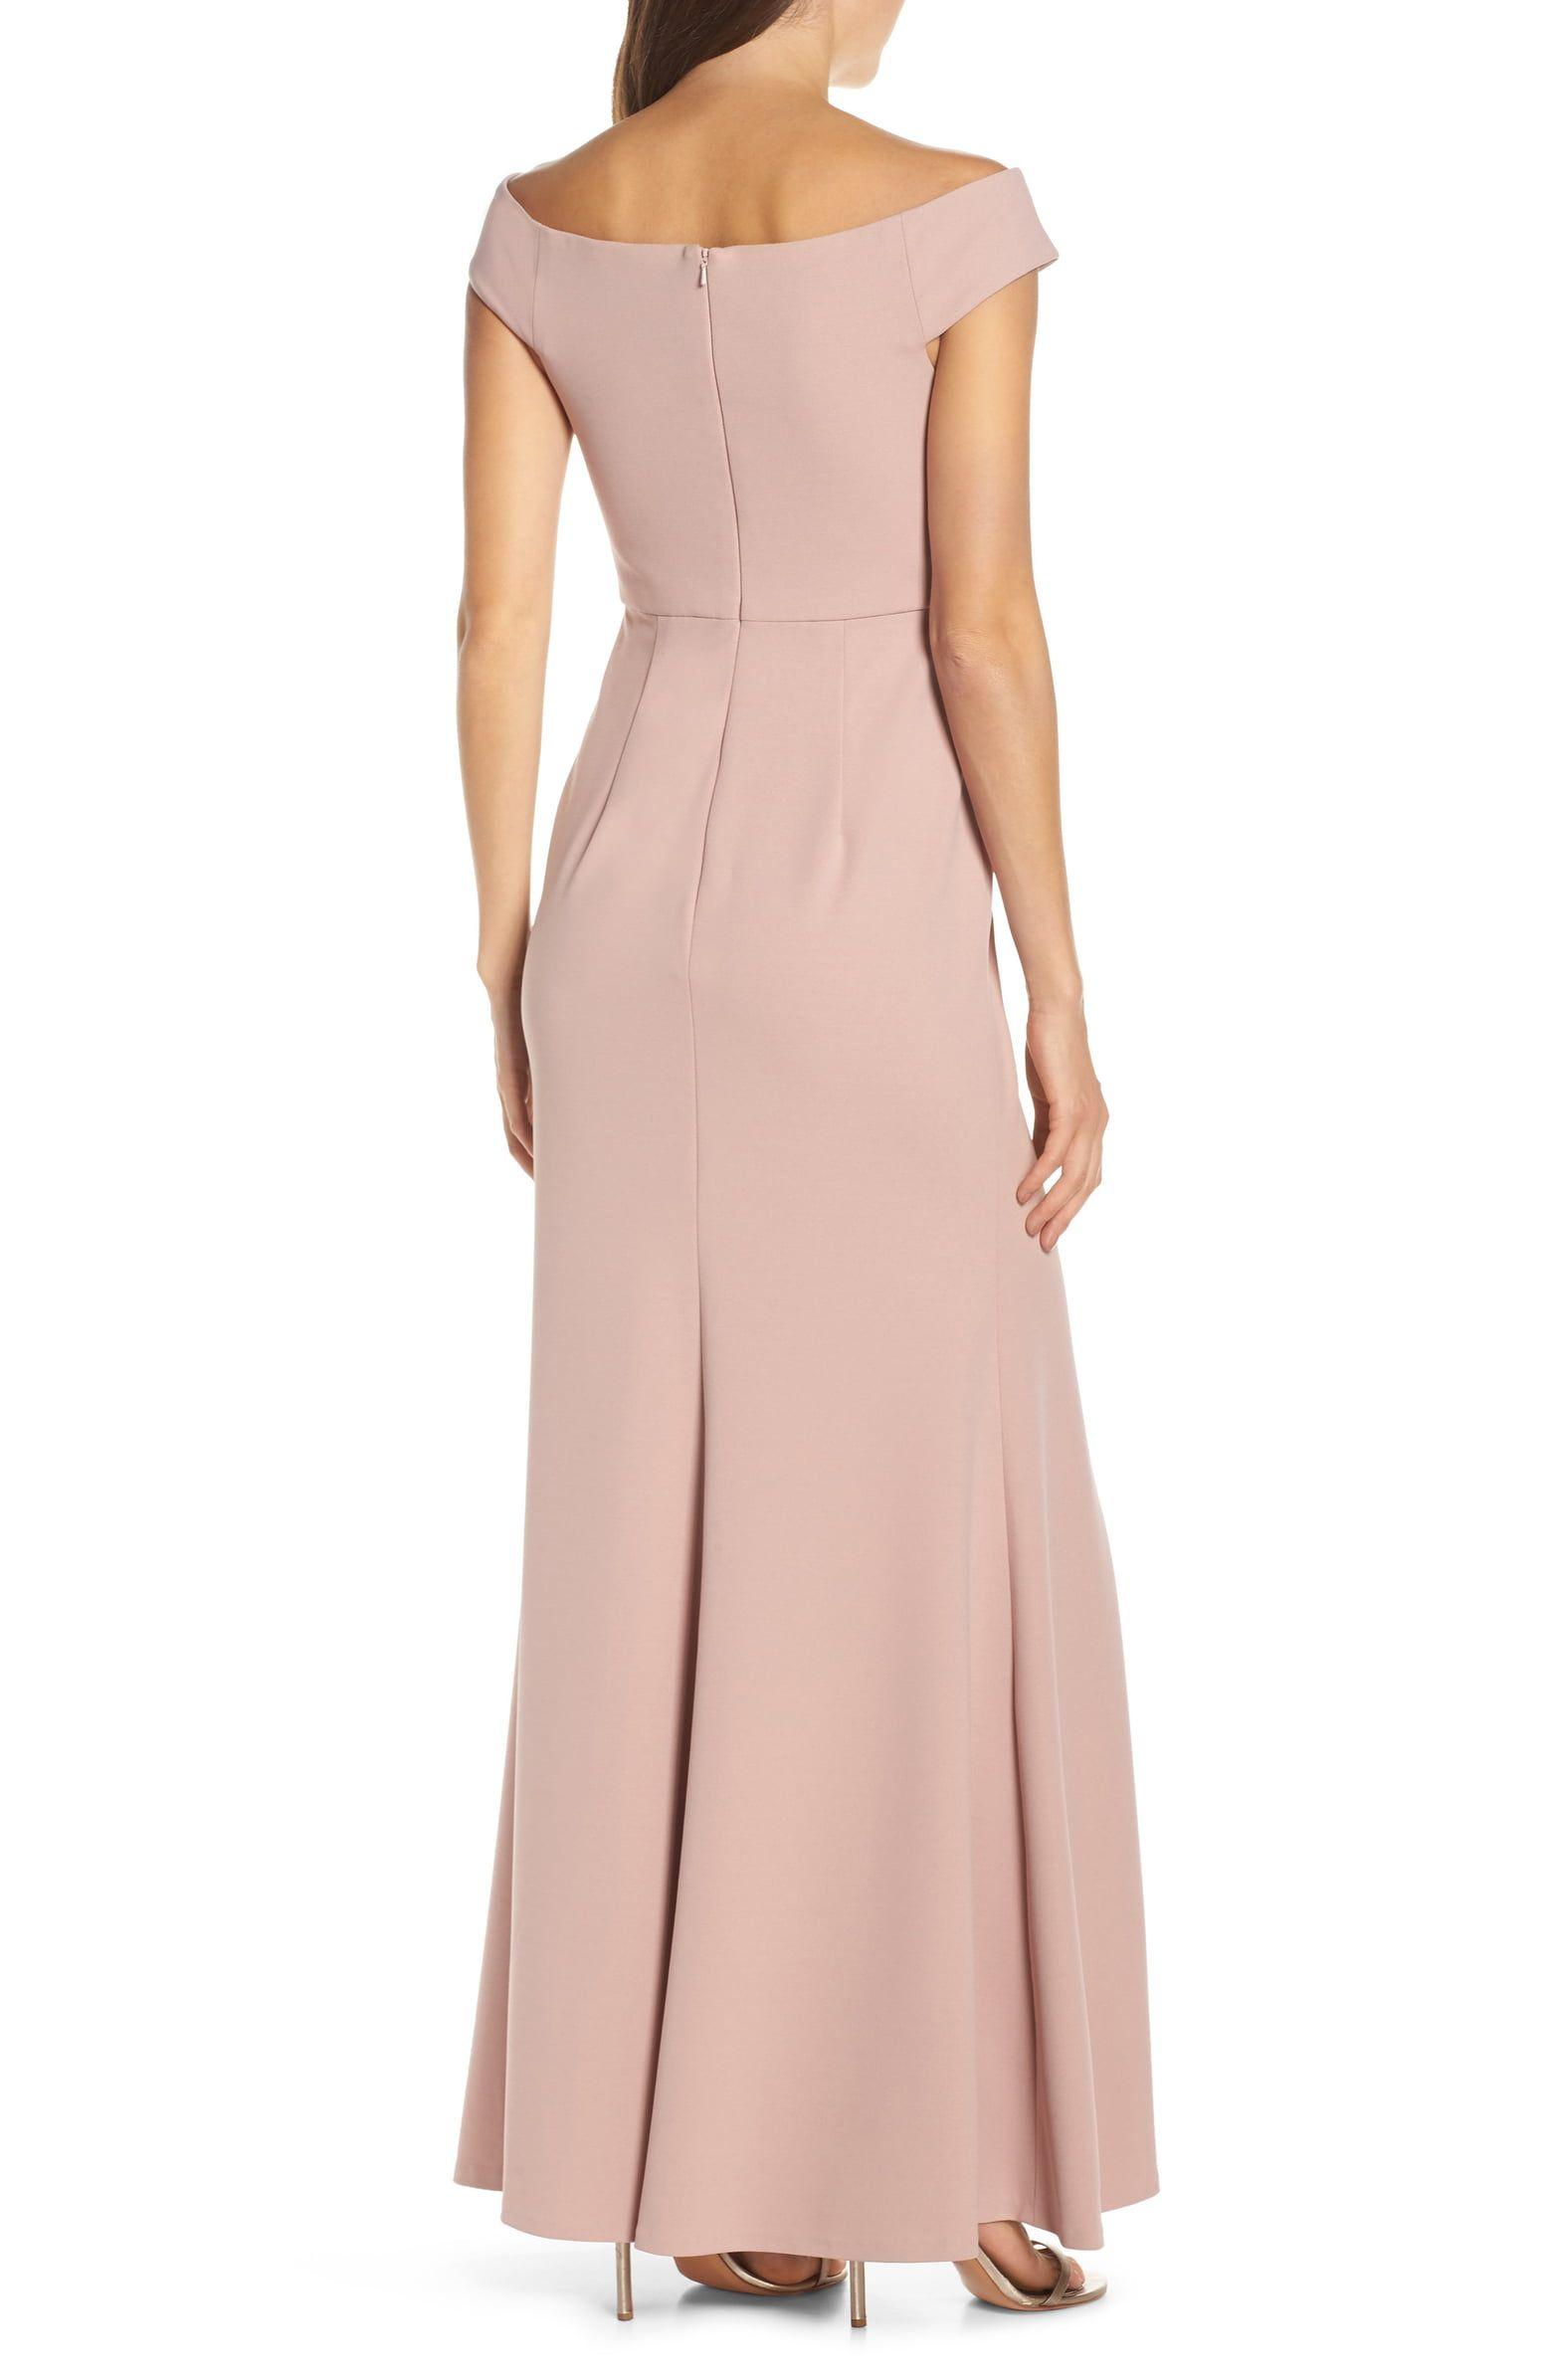 b6a14b0f48 Jenny Yoo Larson Off the Shoulder Crepe Evening Dress